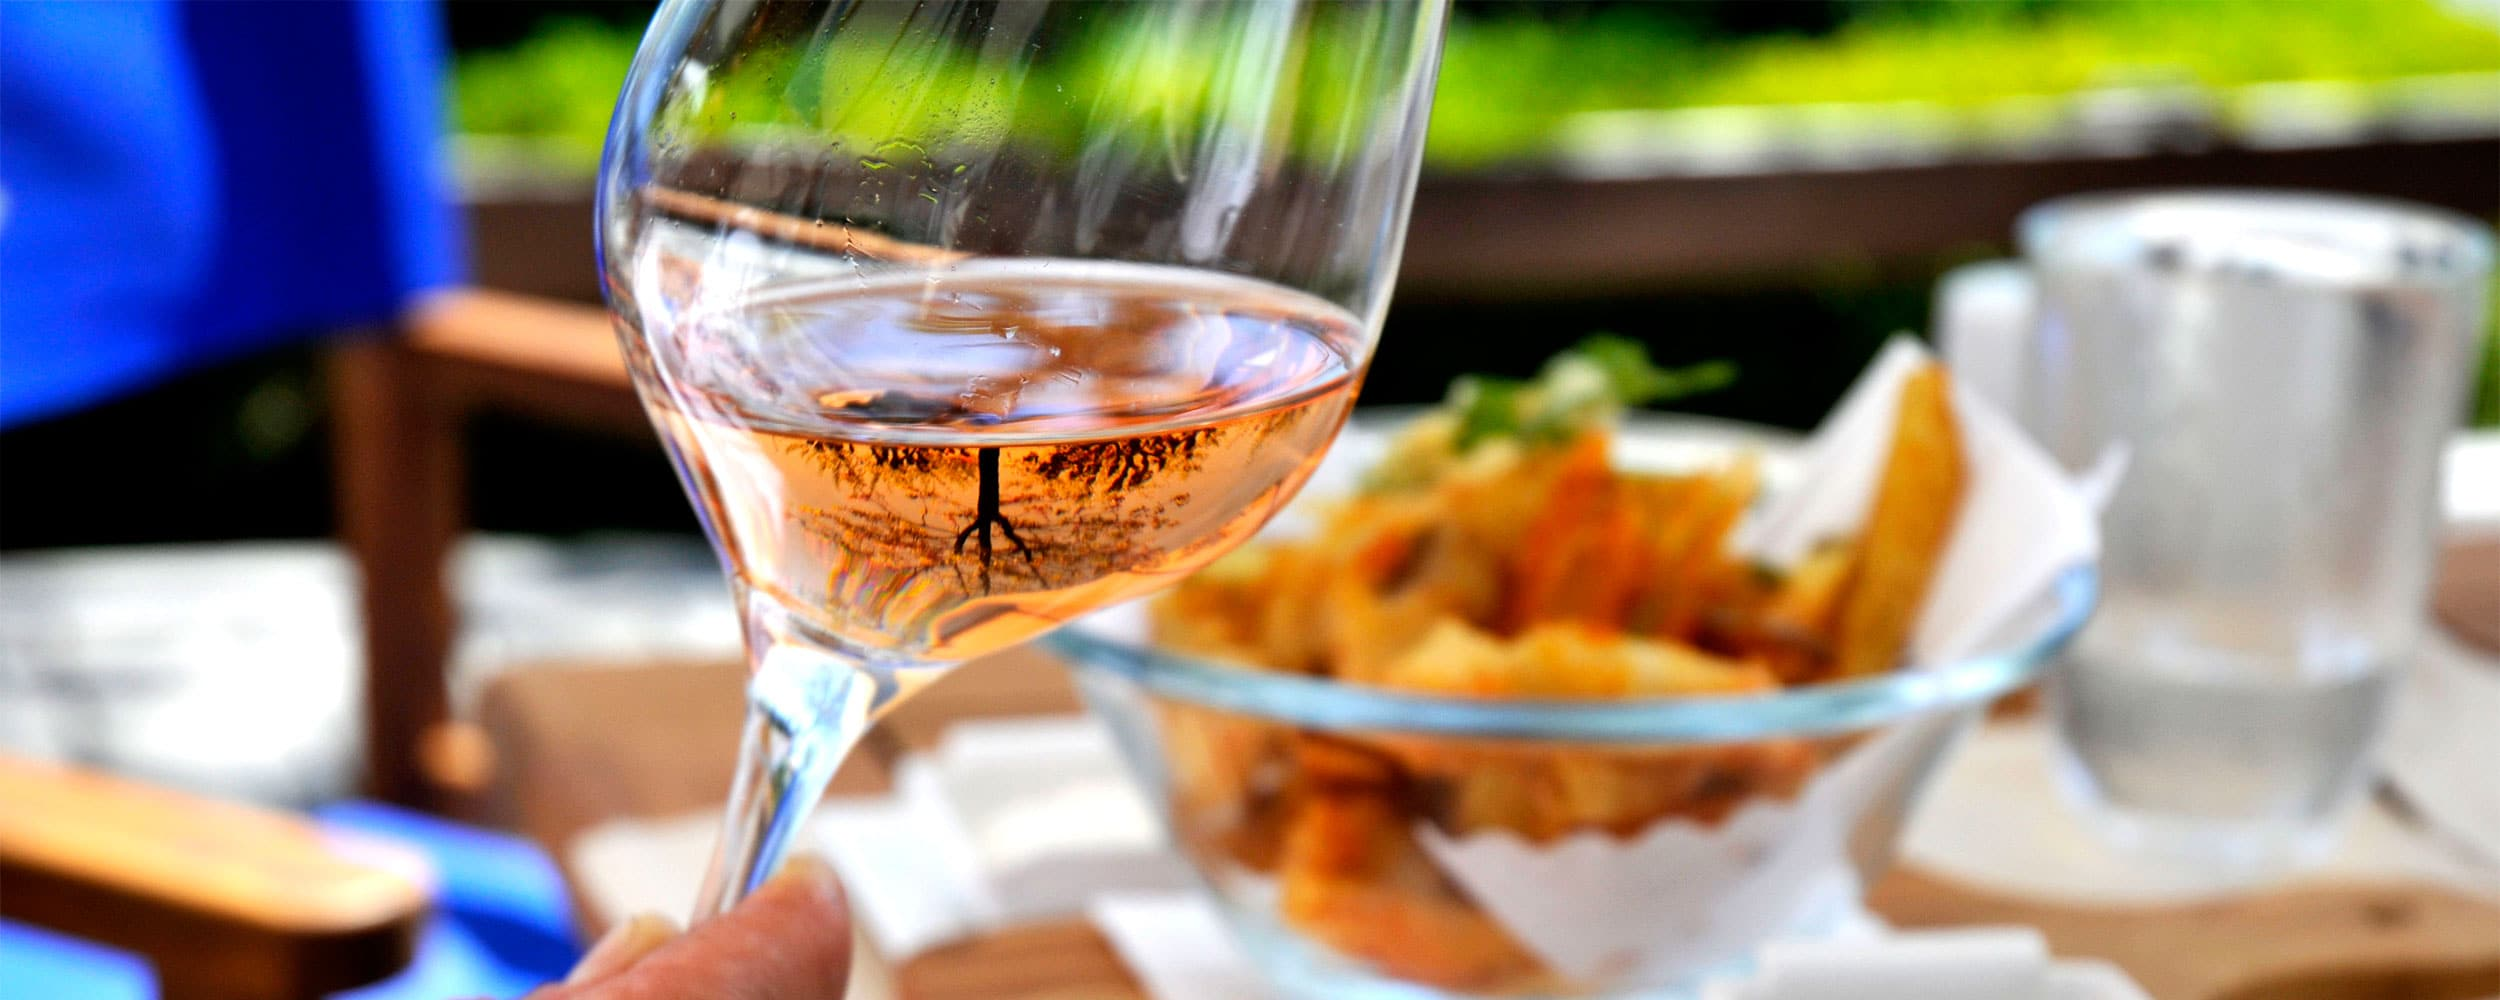 Provence Wine Tour - Rosé wine, food background